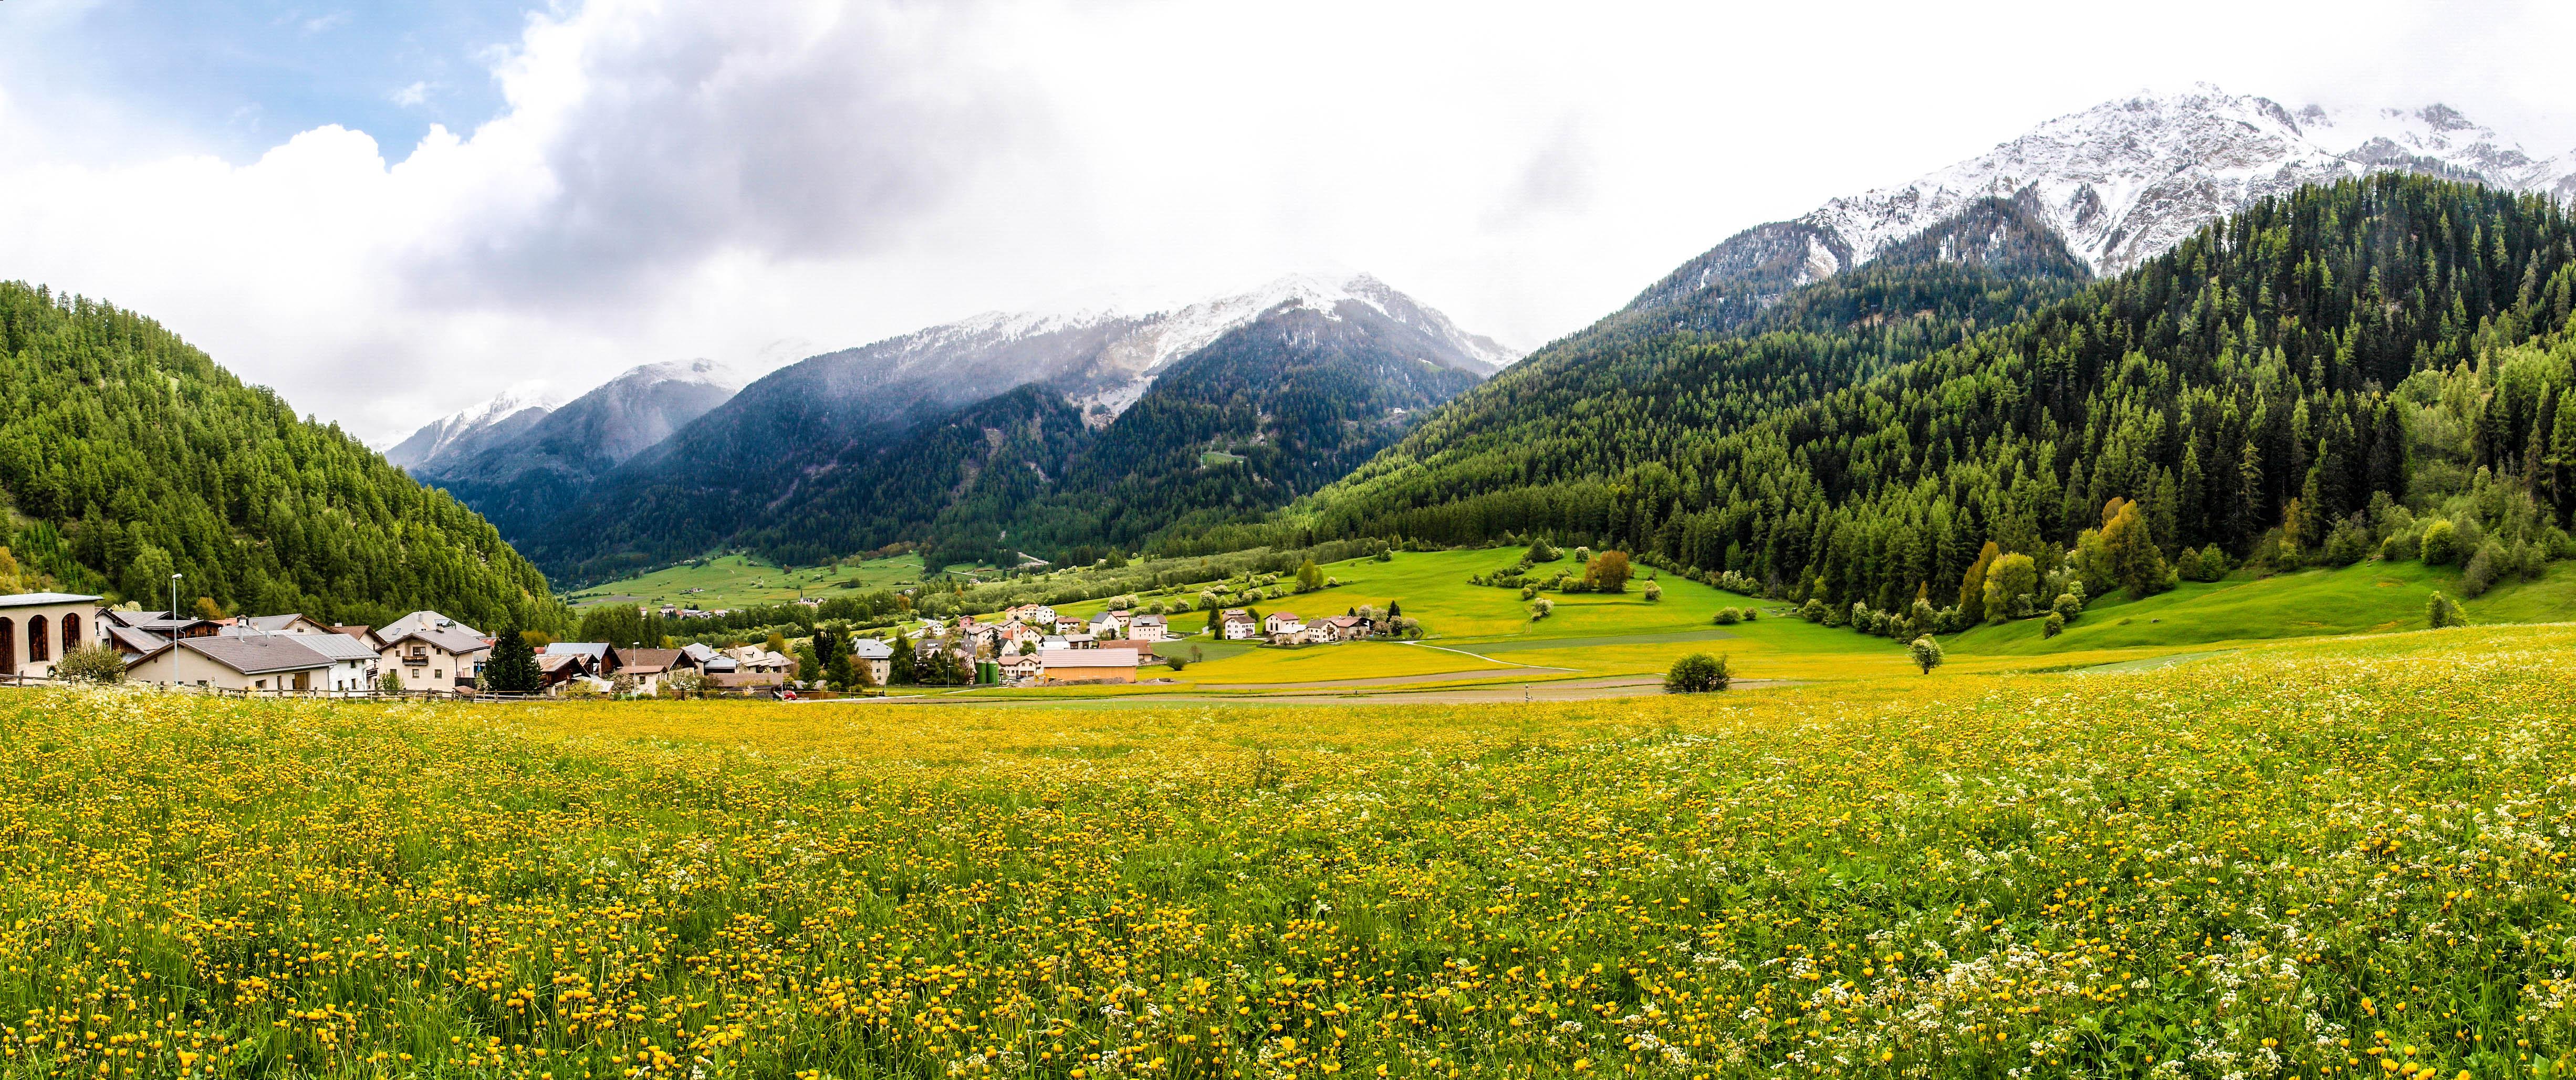 Wellness In S 252 Dtirol 3 Tage Im 4 Hotel Amp Hp F 252 R 149